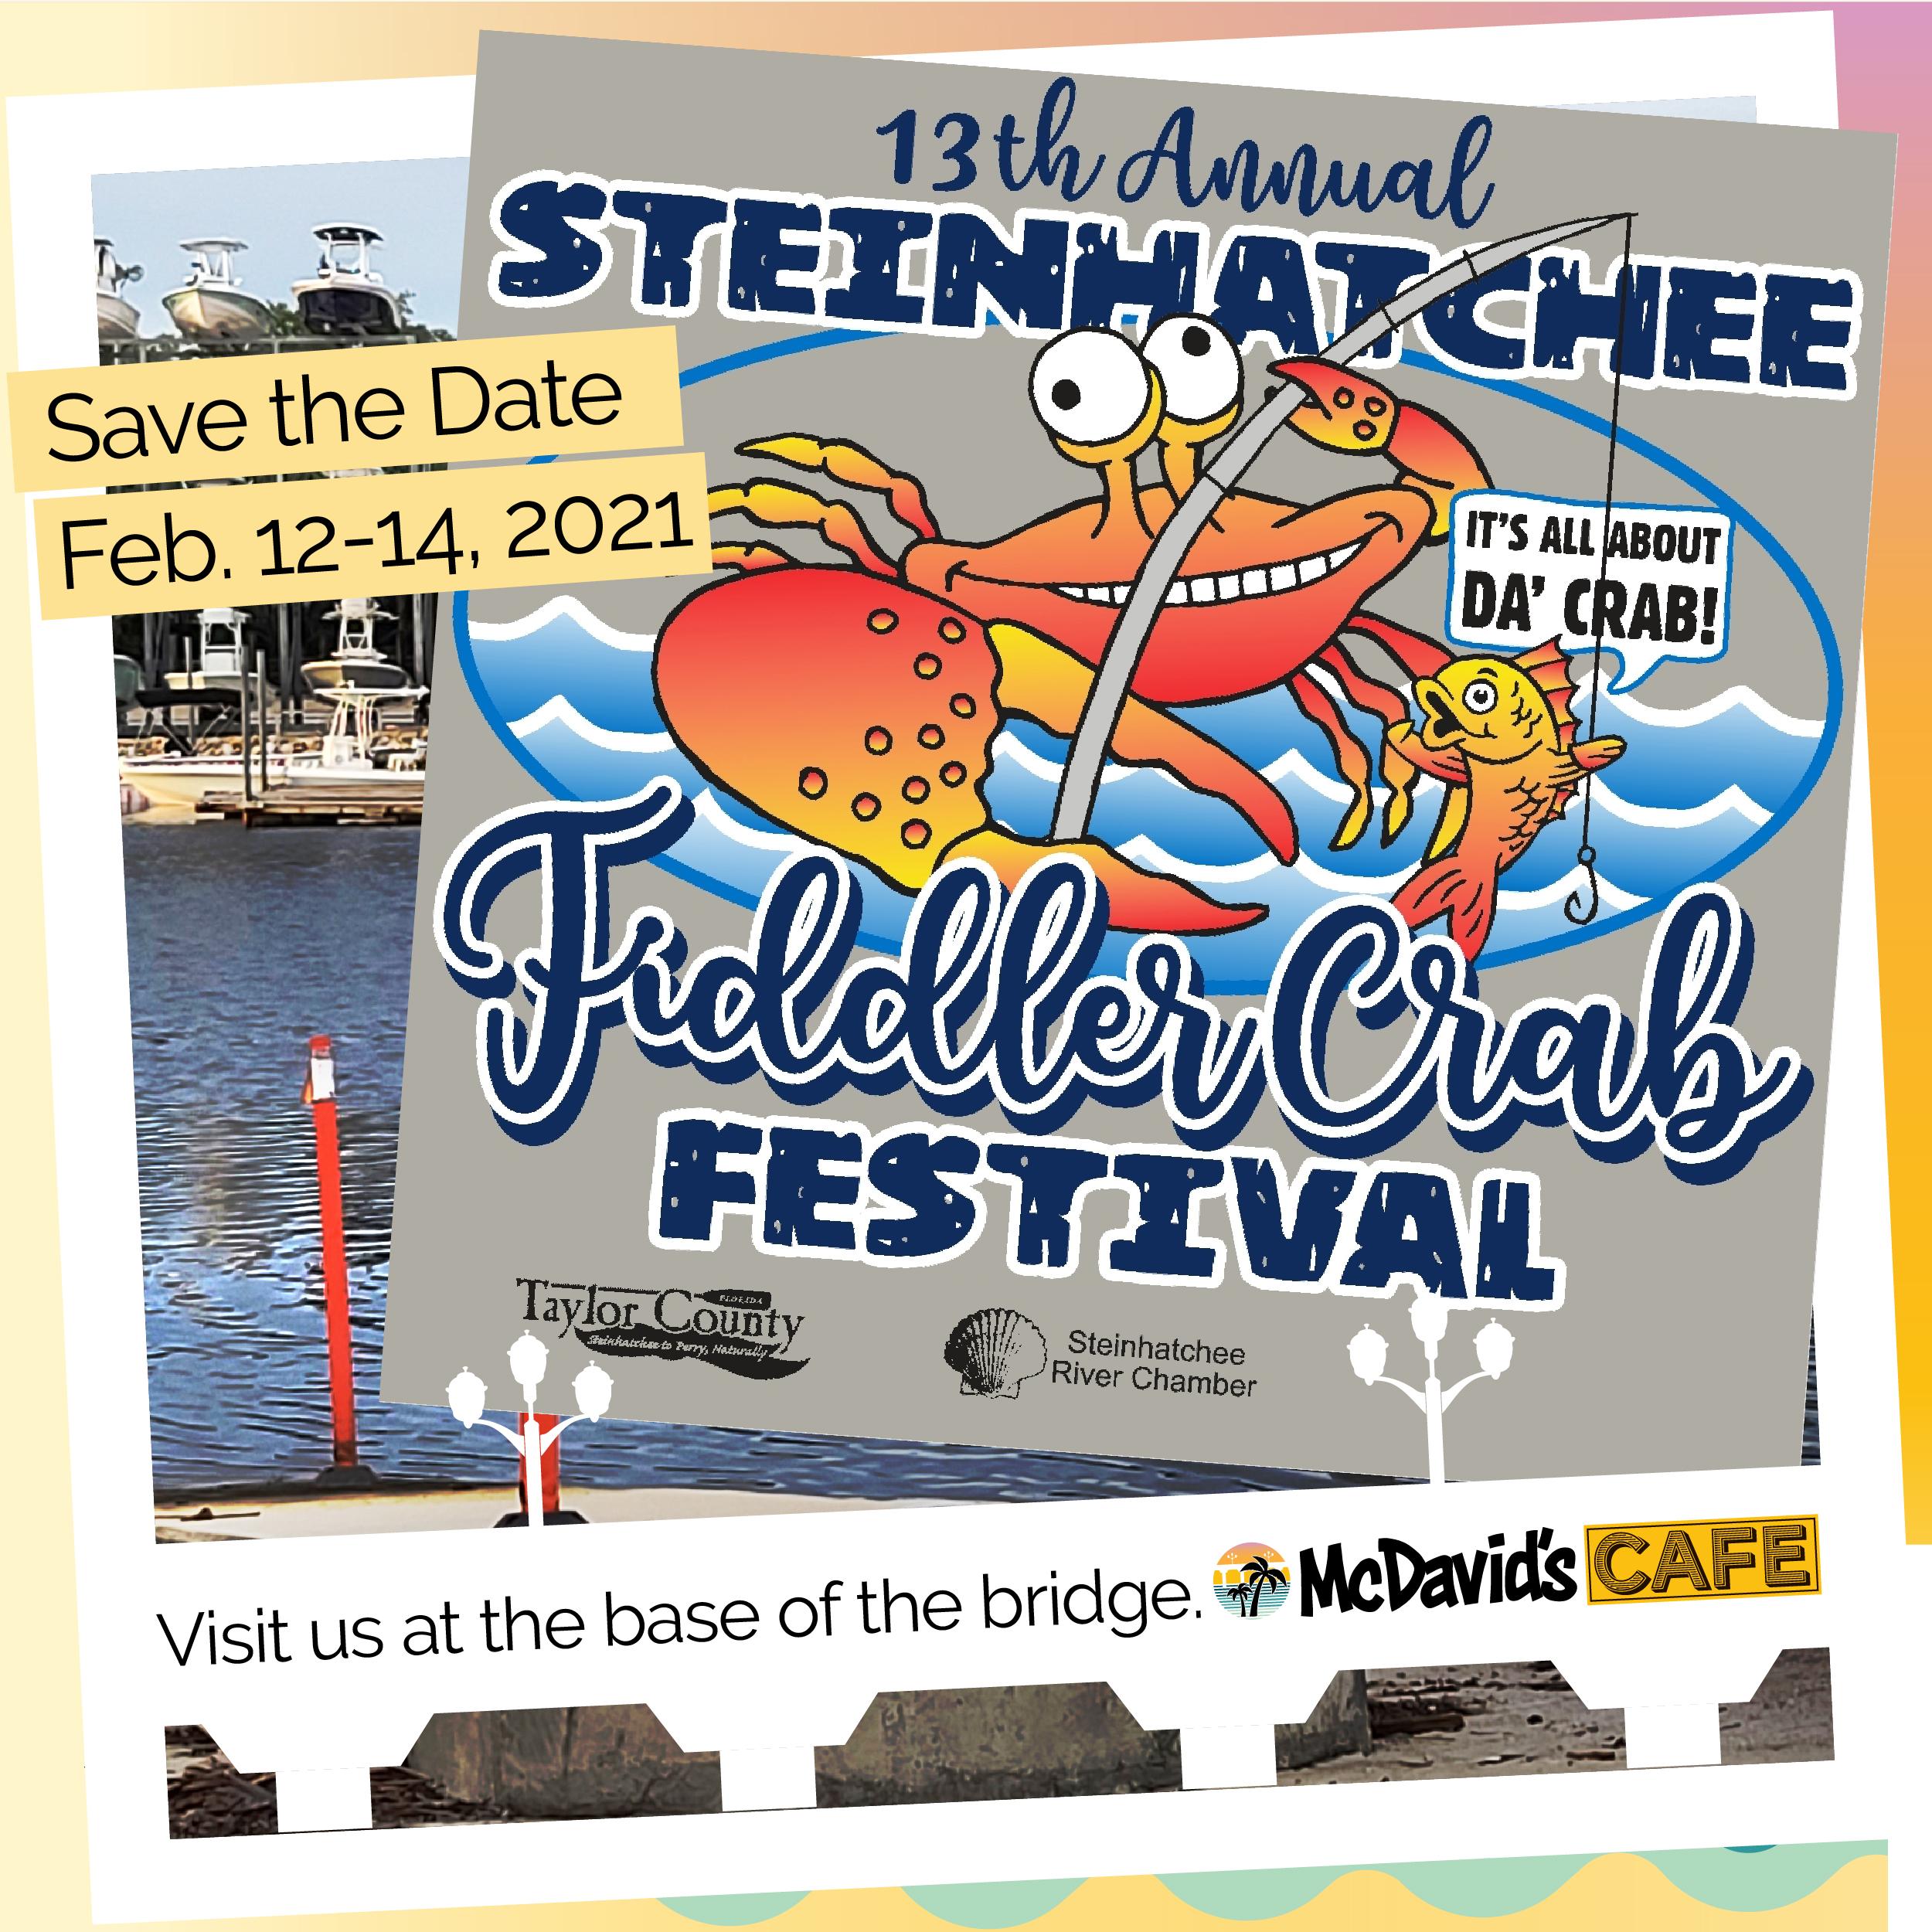 Fiddler Crab Festival 2021 - Steinhatchee, FL | Visit Us at McDavid's Cafe Southern Cuisine